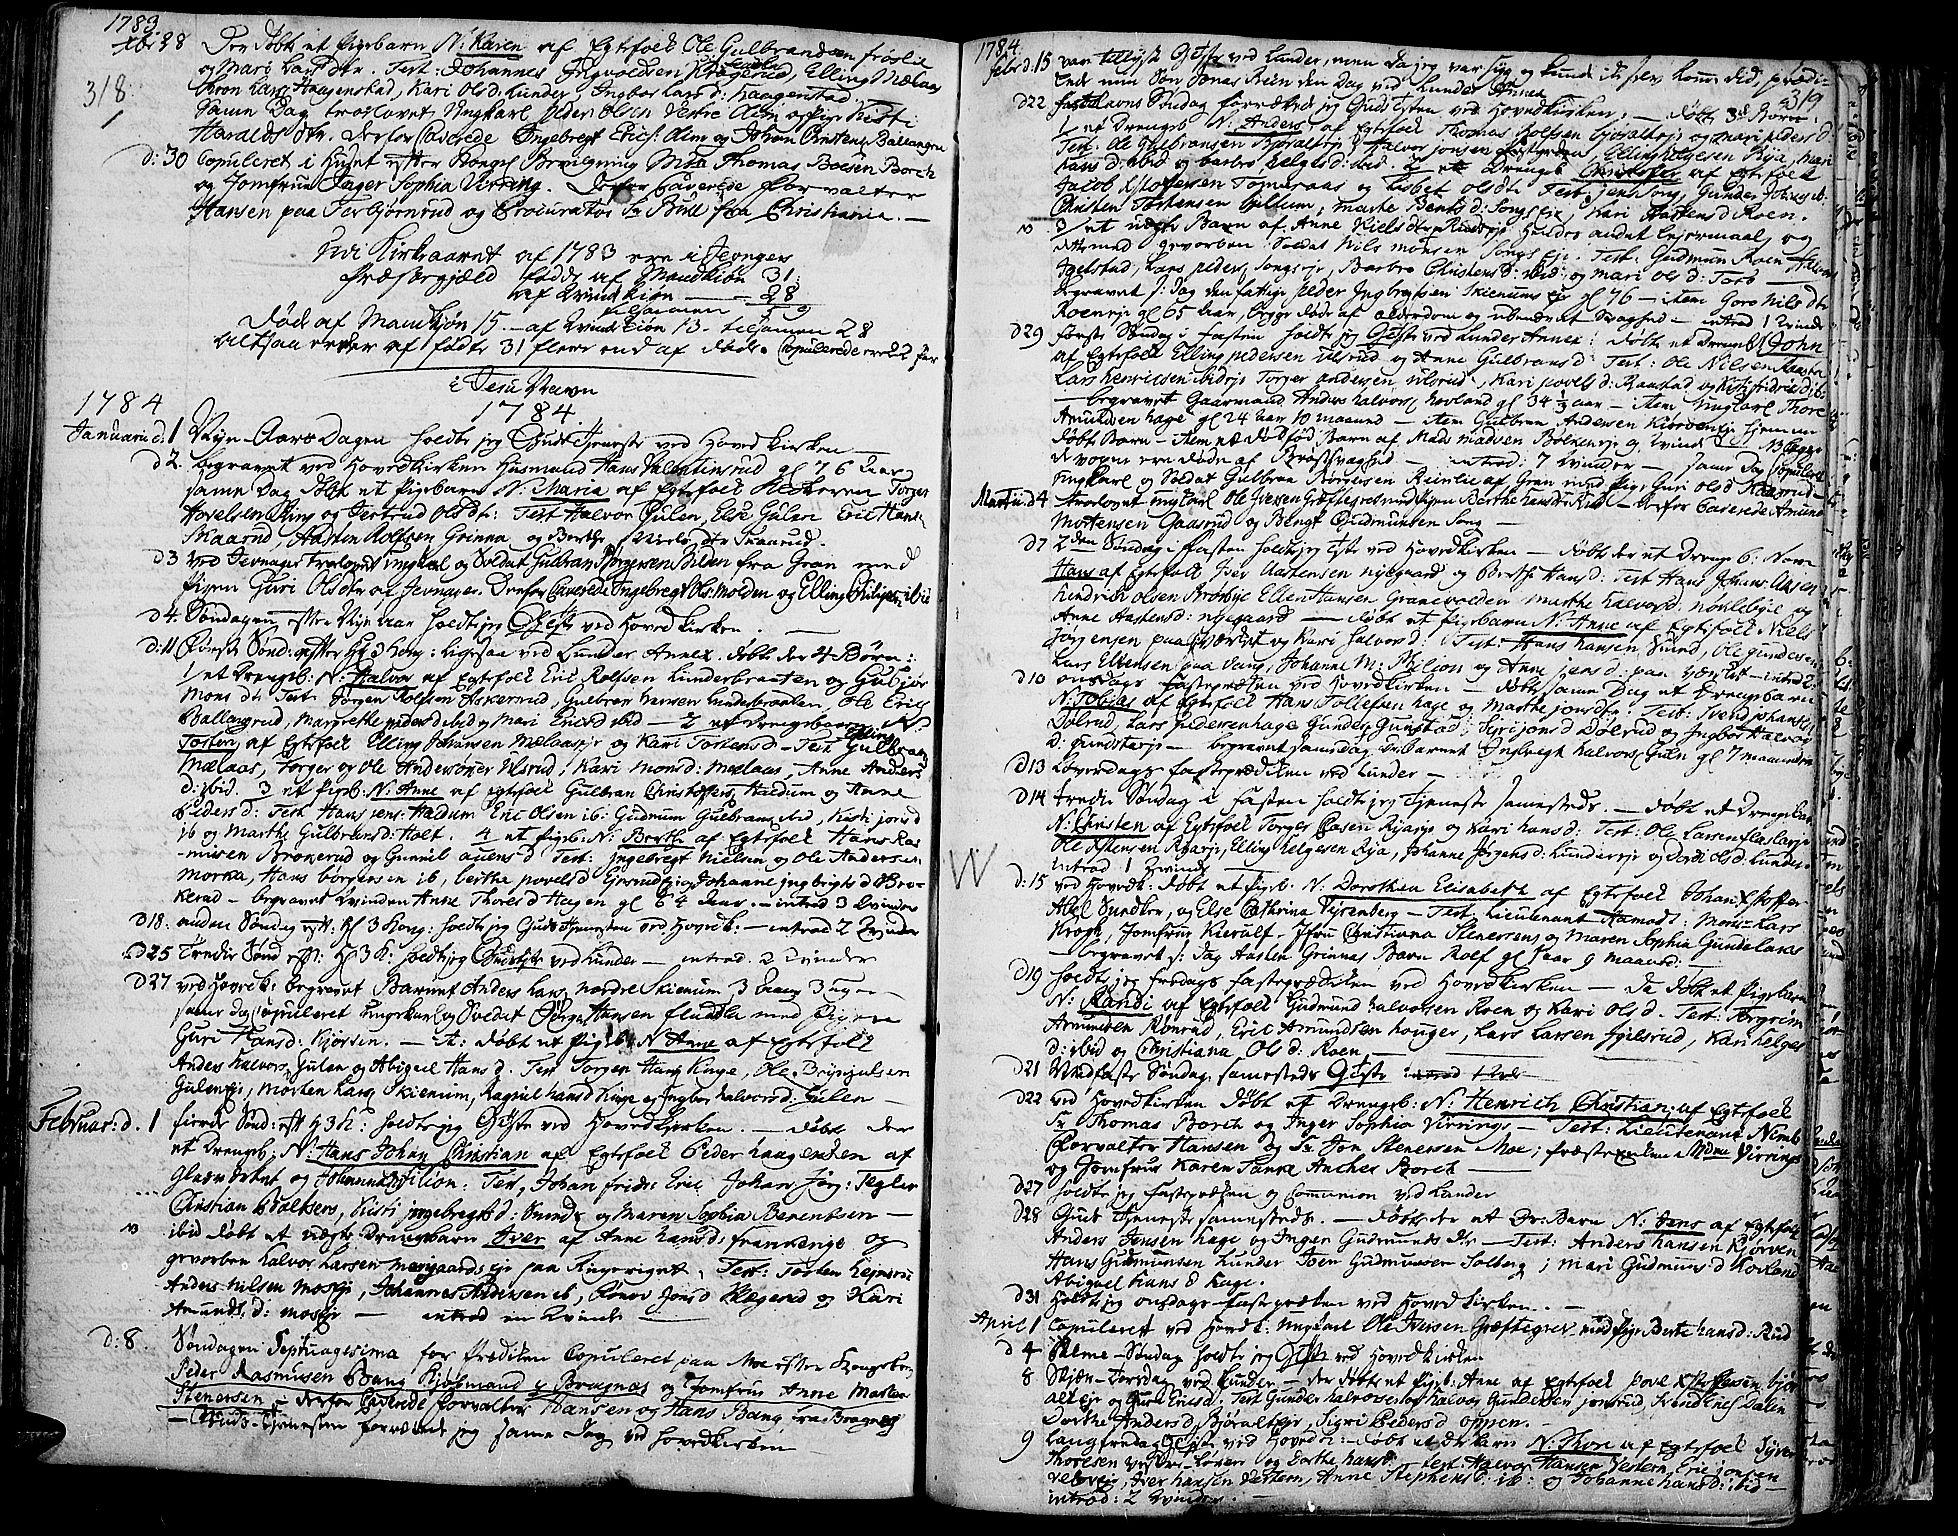 SAH, Jevnaker prestekontor, Ministerialbok nr. 3, 1752-1799, s. 318-319